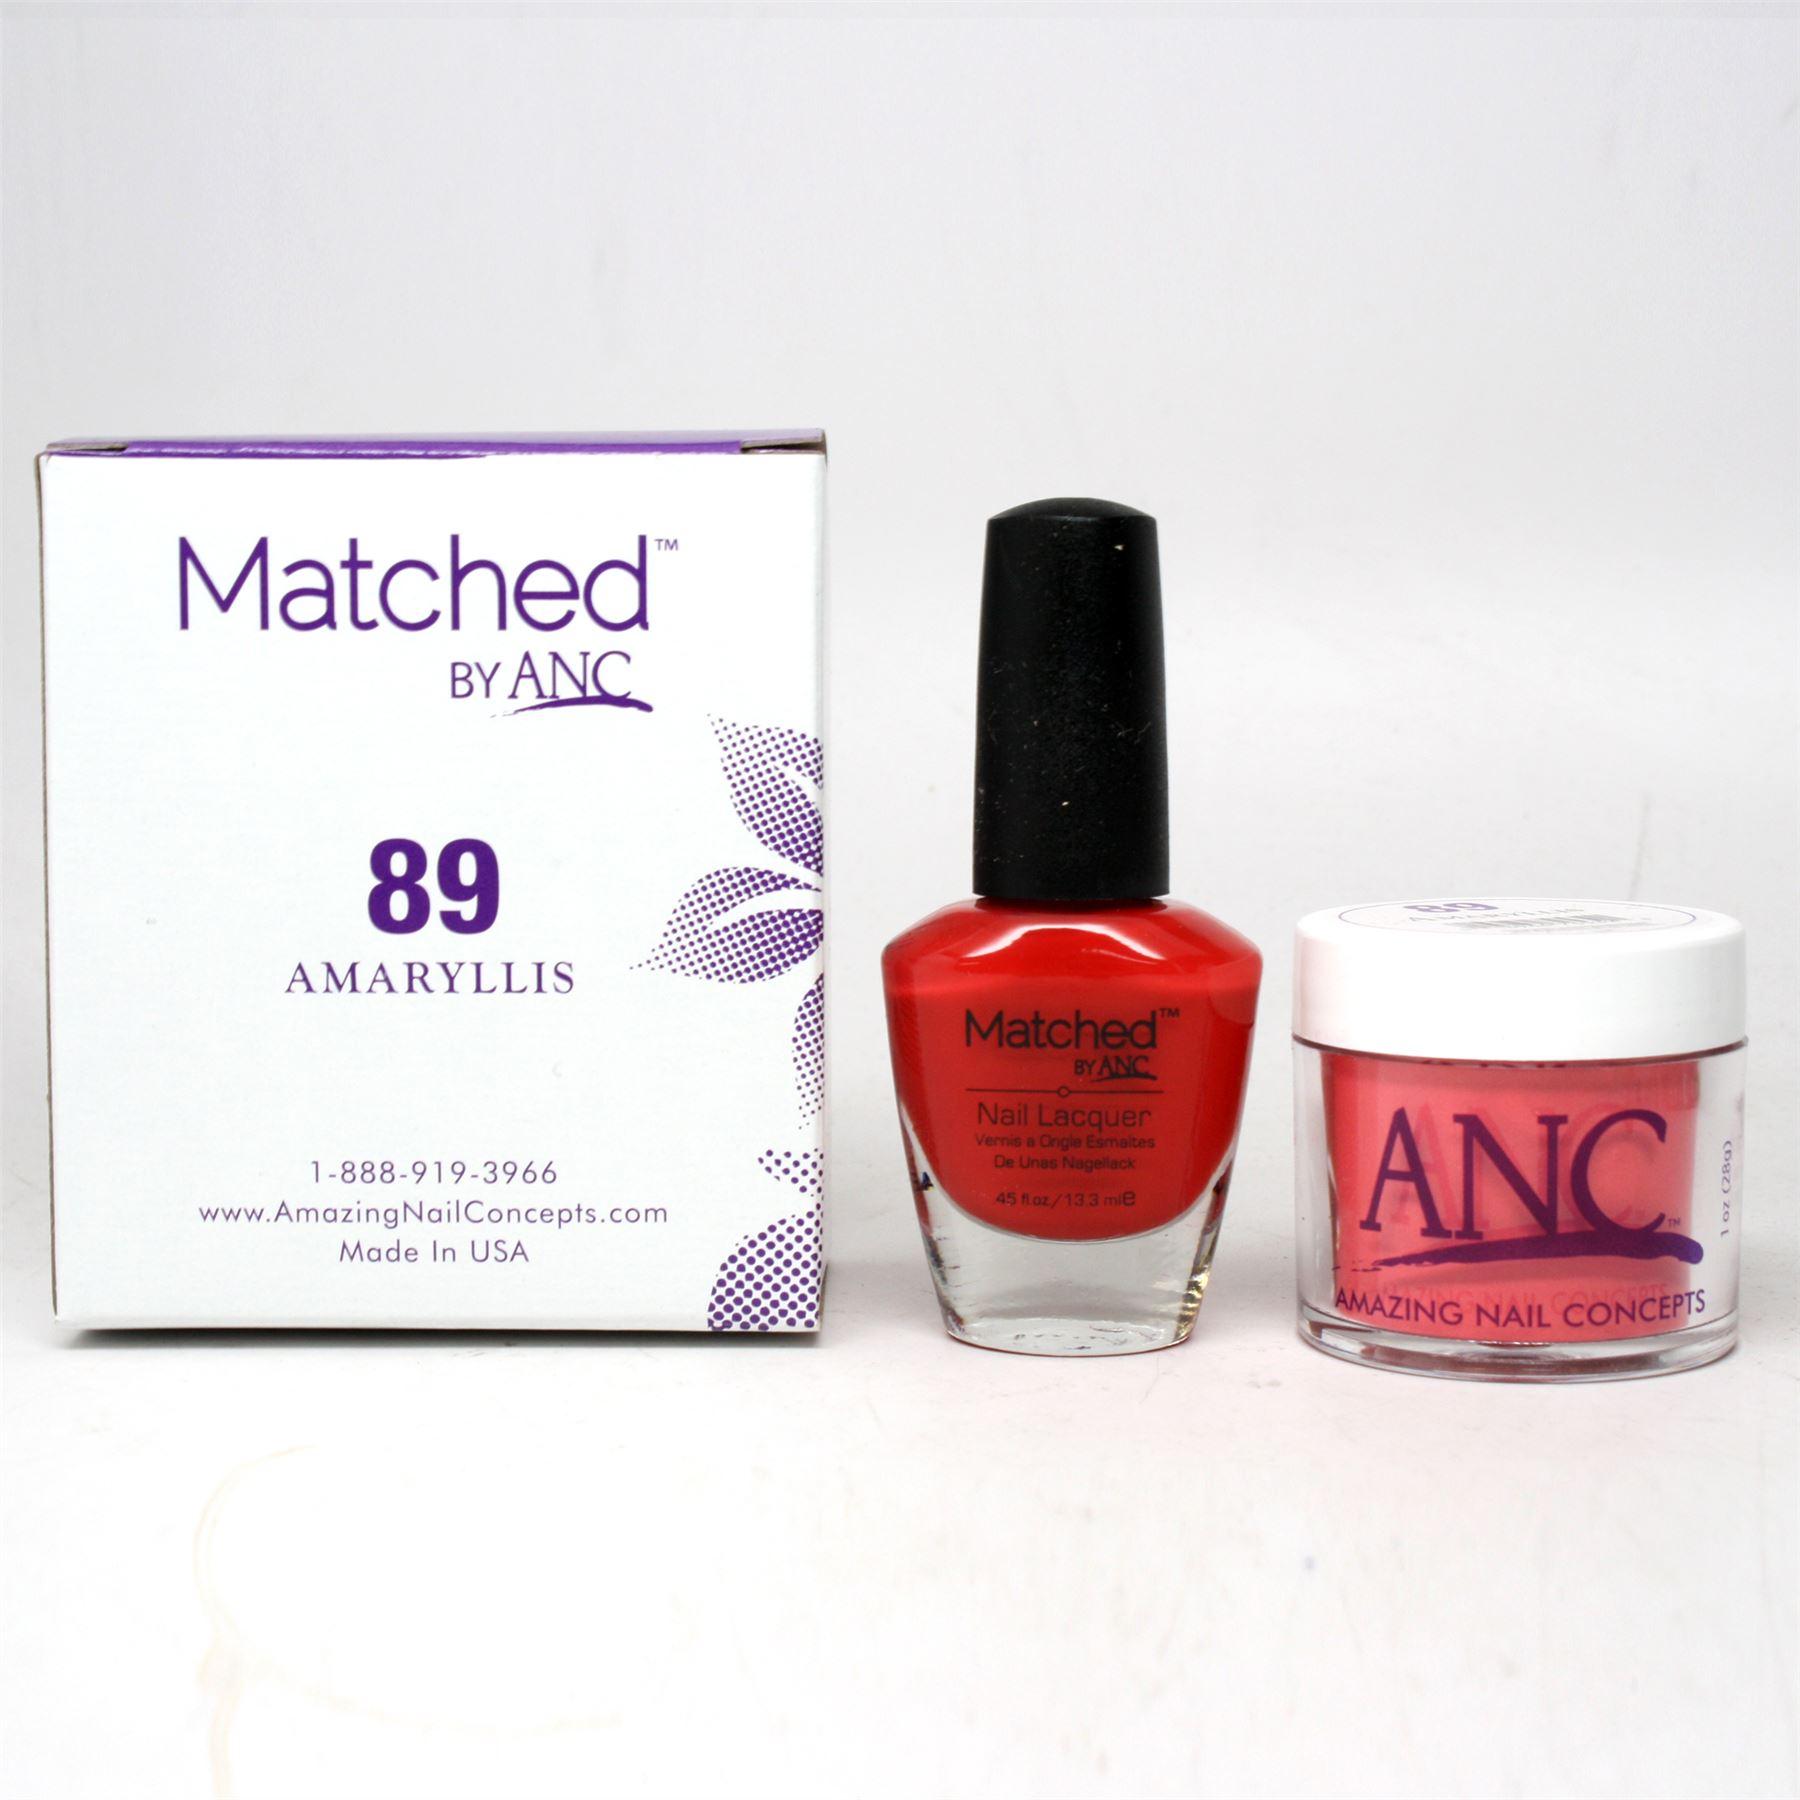 ANC Amazing Nail Concepts Matched Kit # 89 Amaryllis